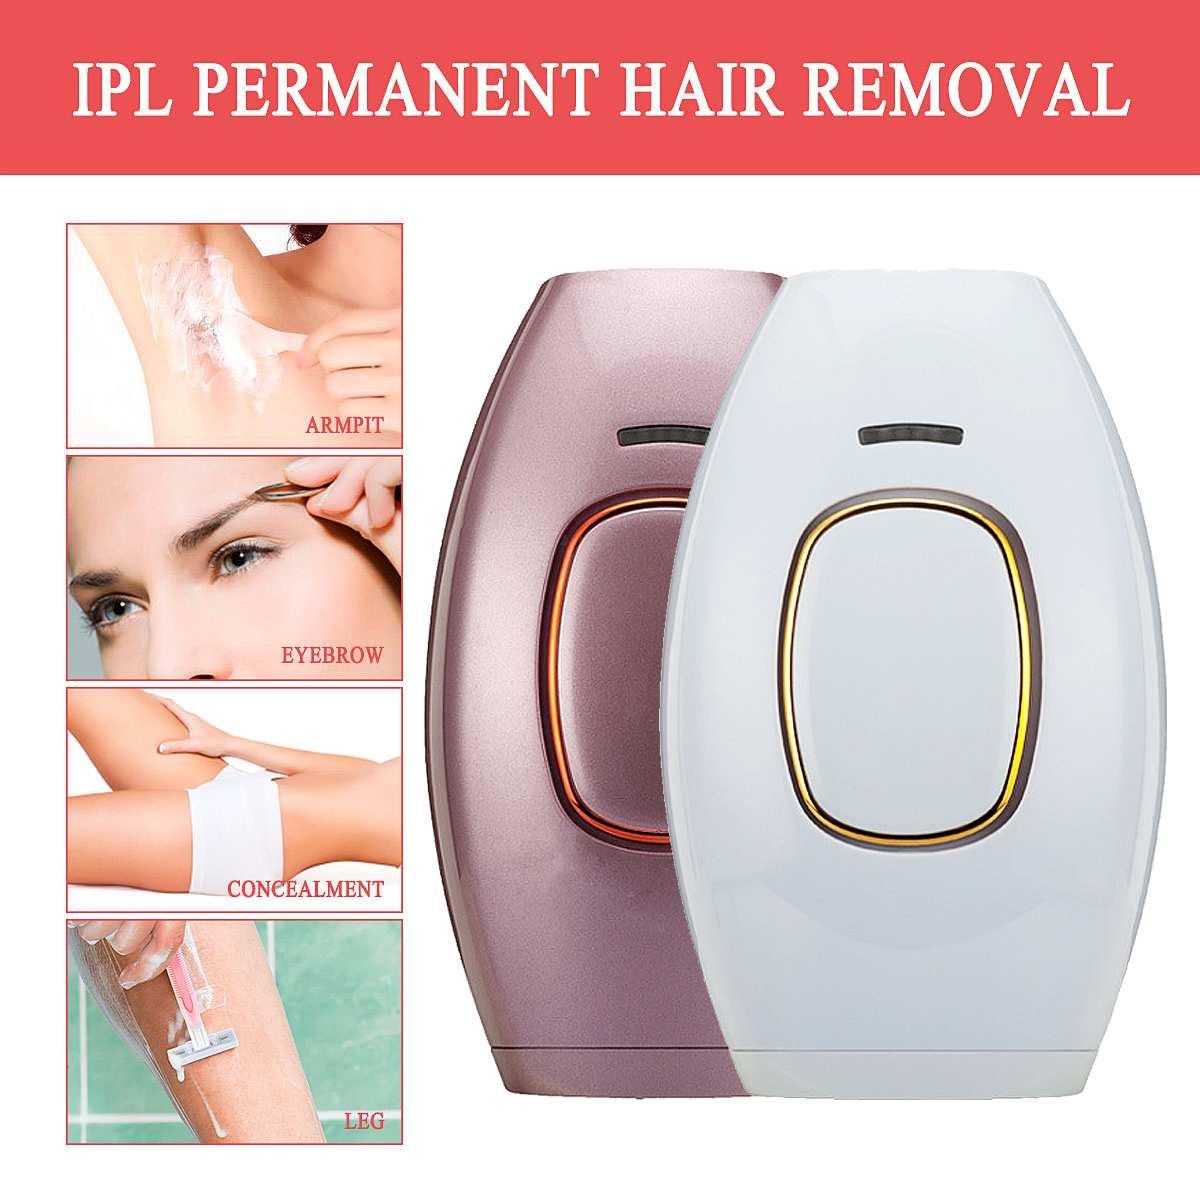 500000 Pulses IPL Laser Epilator Portable Depilator Machine Full Body Hair Removal Device Painless Personal Care Appliance New Интенсивное импульсное световое излучение